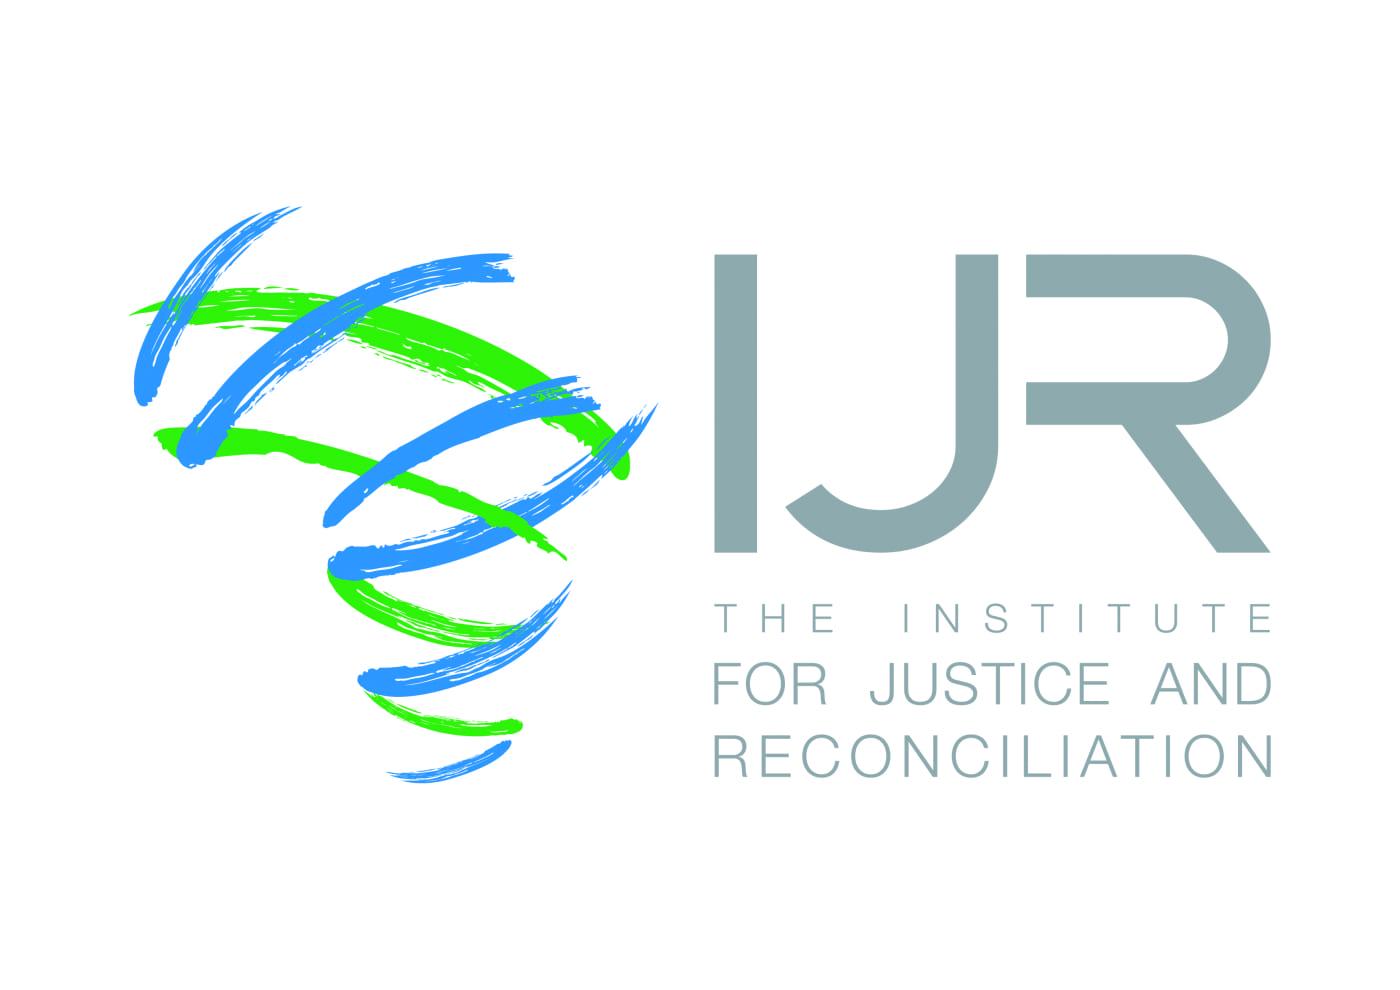 Institute for Justice and Reconciliation (IJR) Peacebuilding Interventions Internship 2019